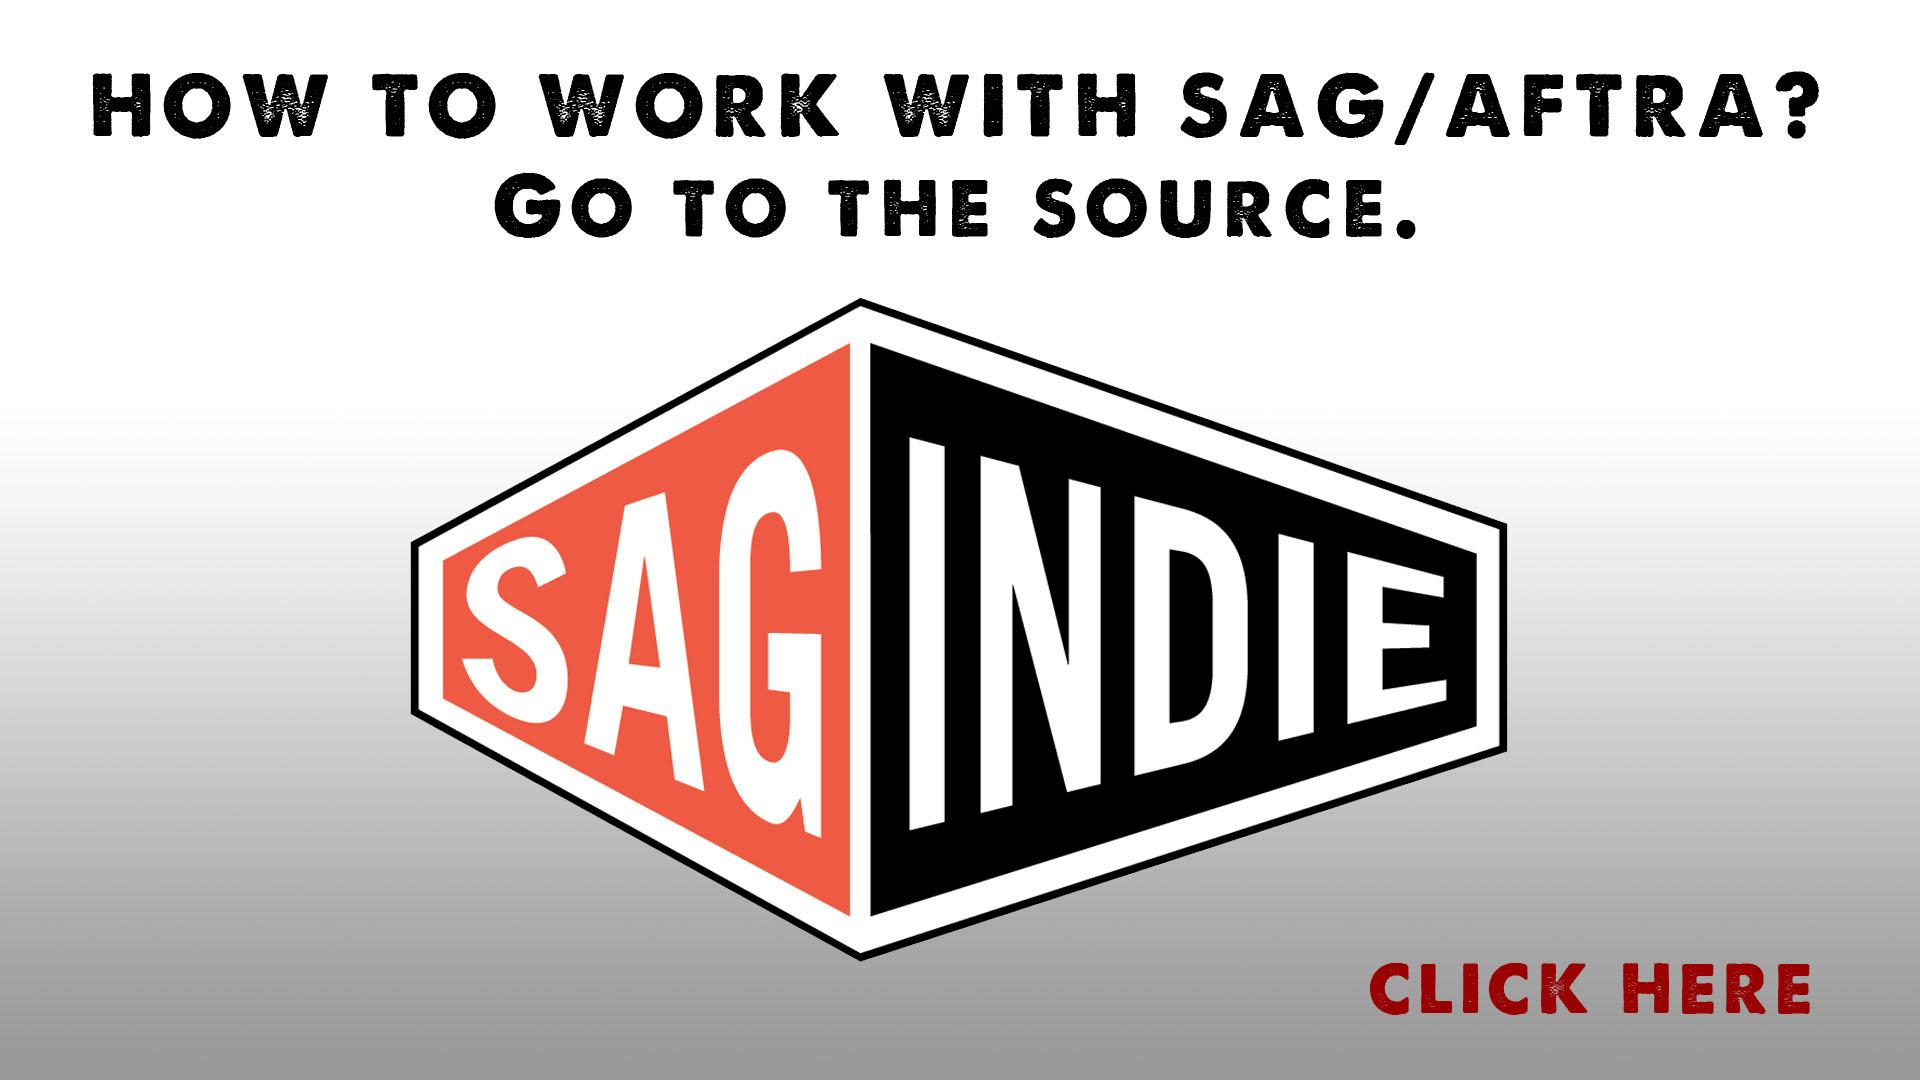 Sag Banner